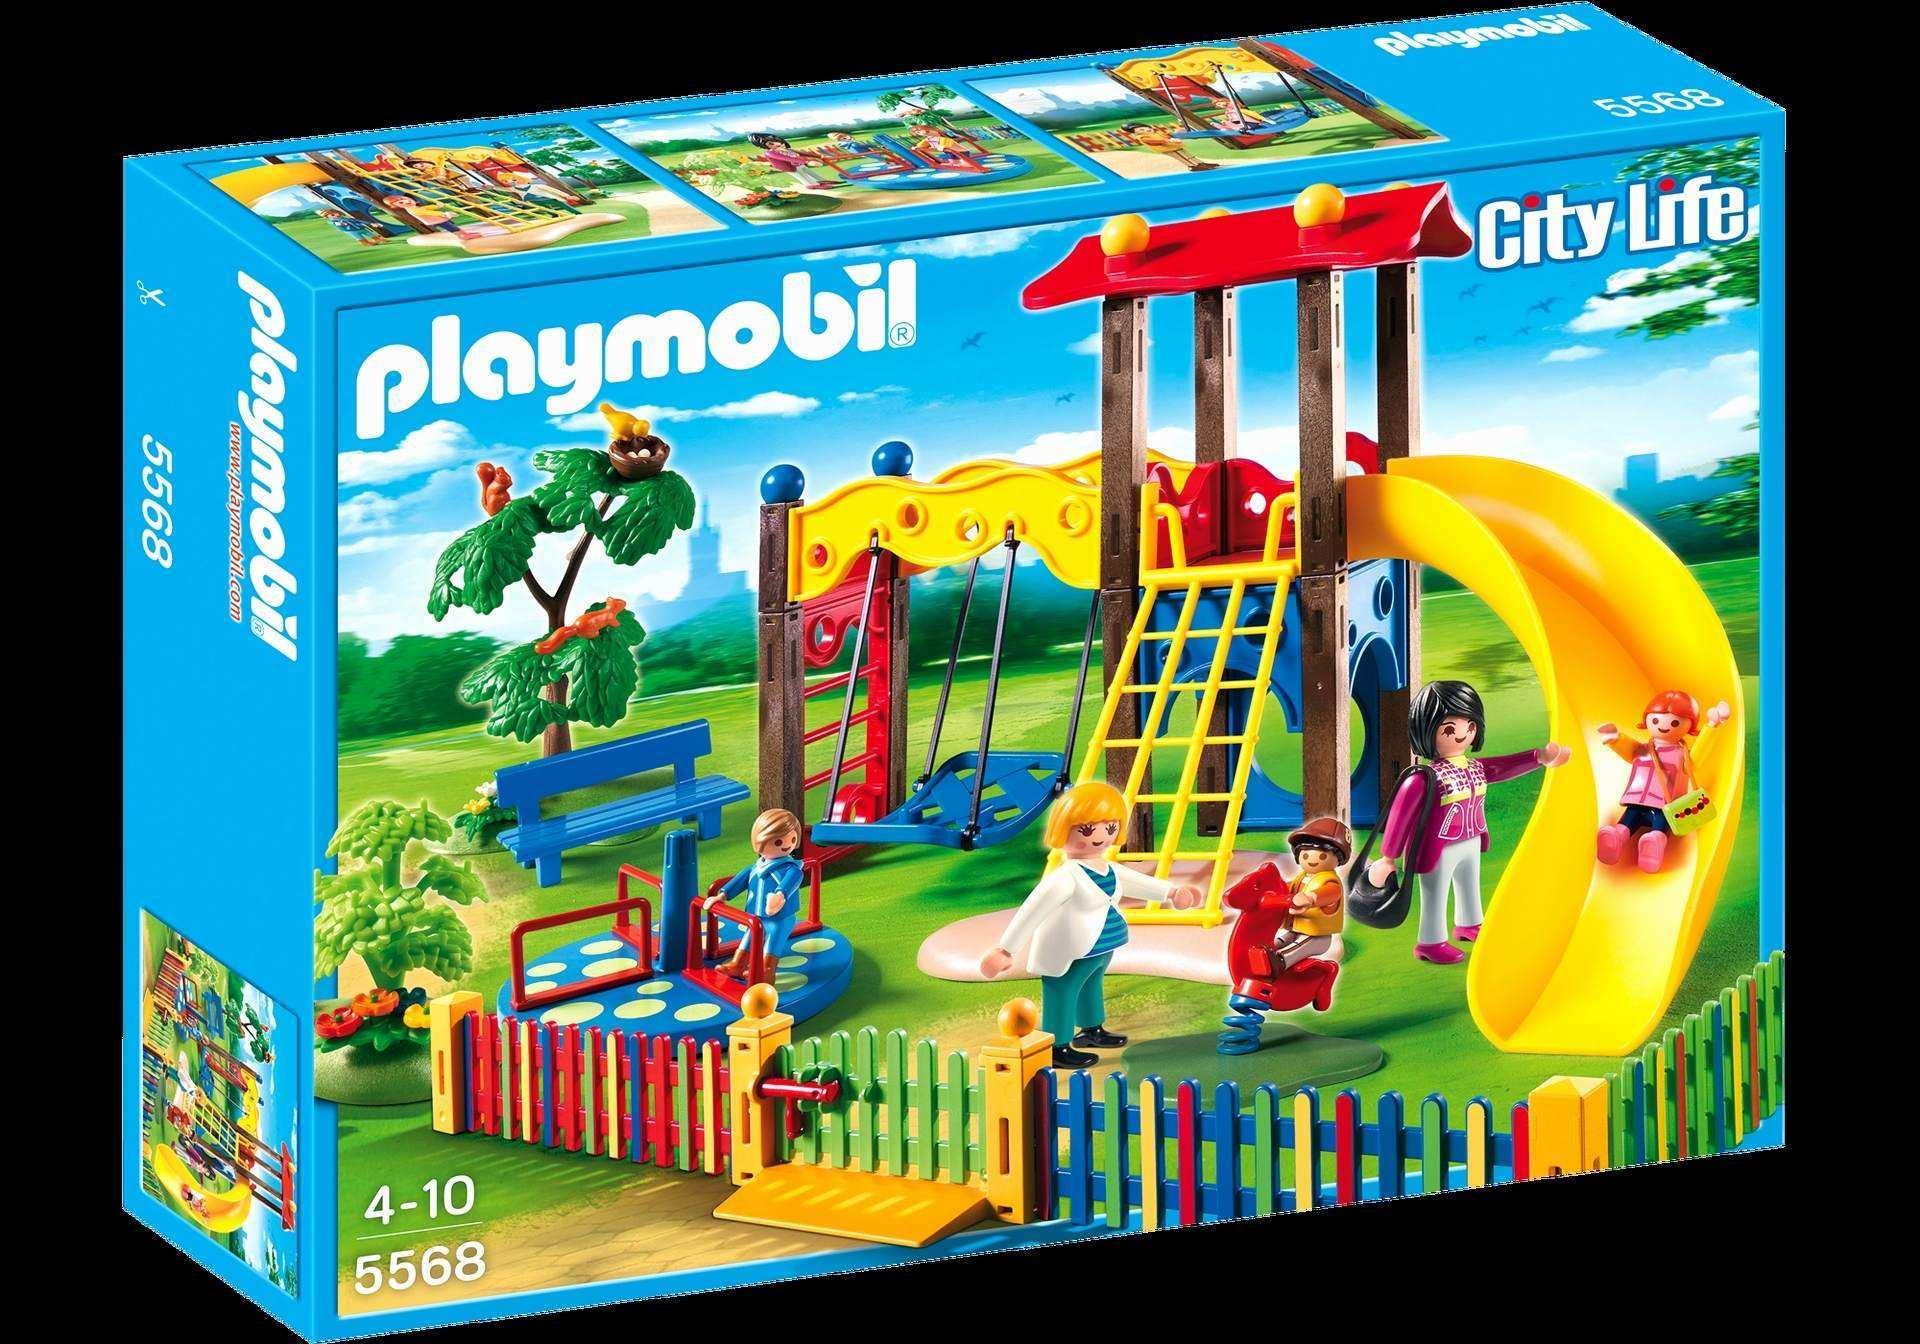 Playmobil city life grand jardin - escapadeslegendes.fr